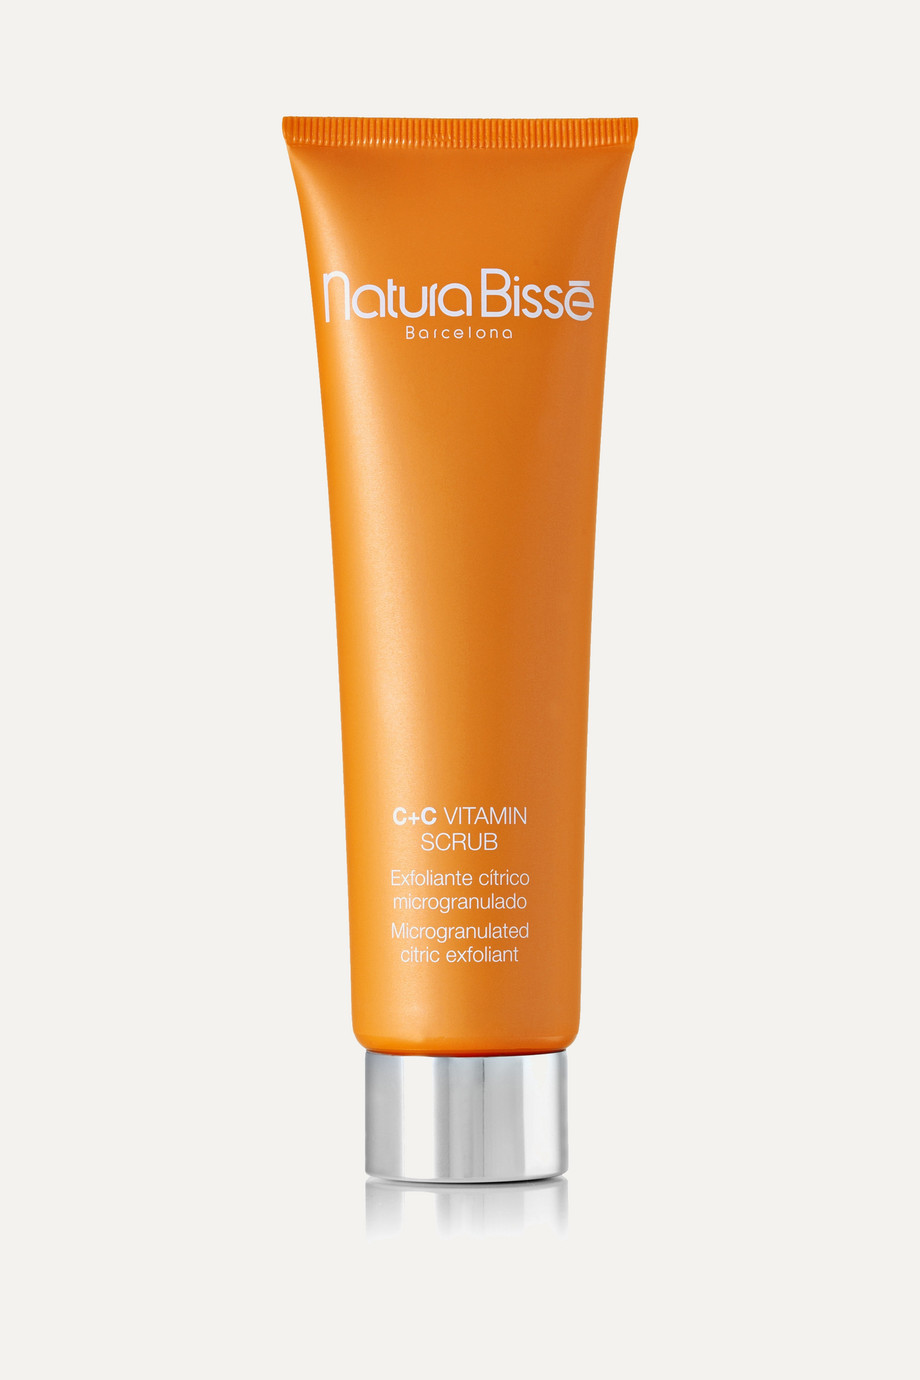 Natura Bissé C+C Vitamin Scrub, 100ml – Gesichtspeeling